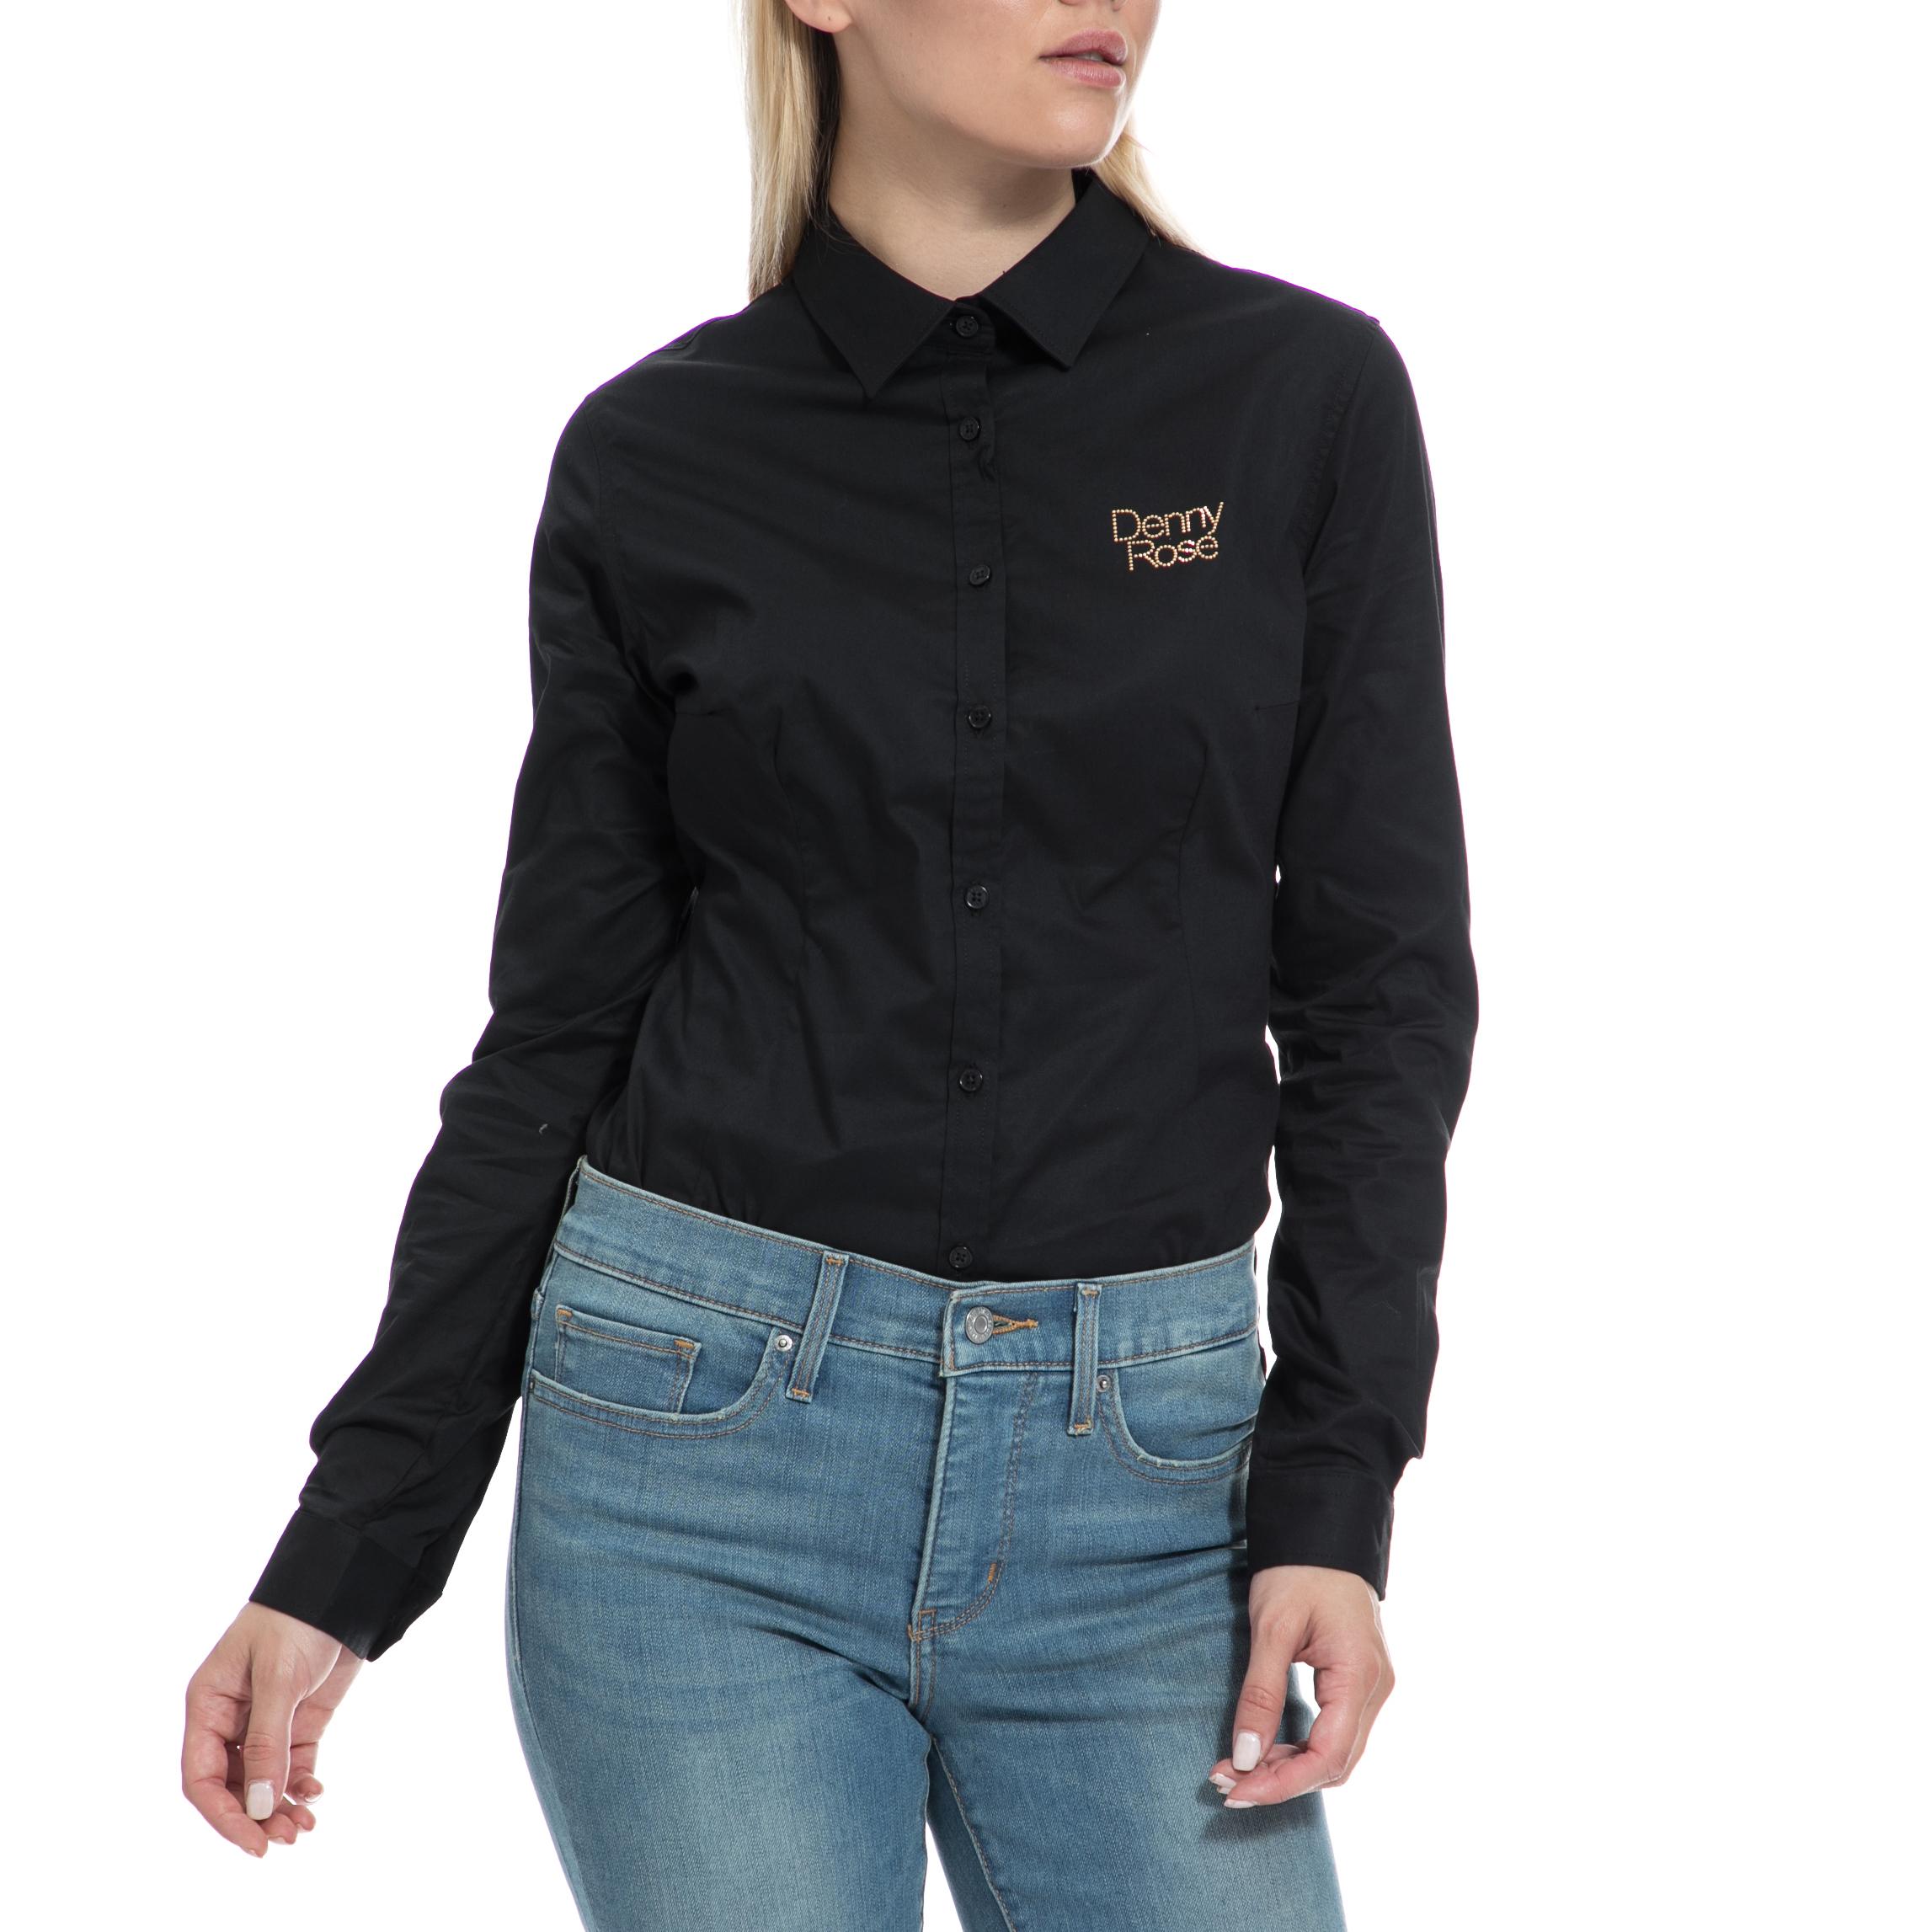 DENNY ROSE – Γυναικείο πουκάμισο-κορμάκι DENNY ROSE μαύρο